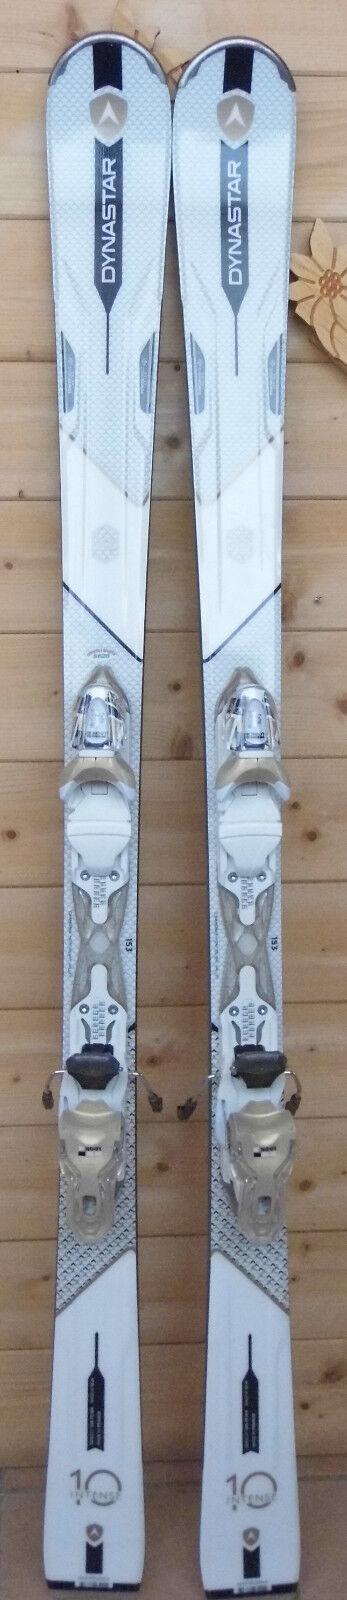 Ski neu neu Ski DYNASTAR intensiv 10 - 146cm & 153cm - Saison 2016/2017 096522